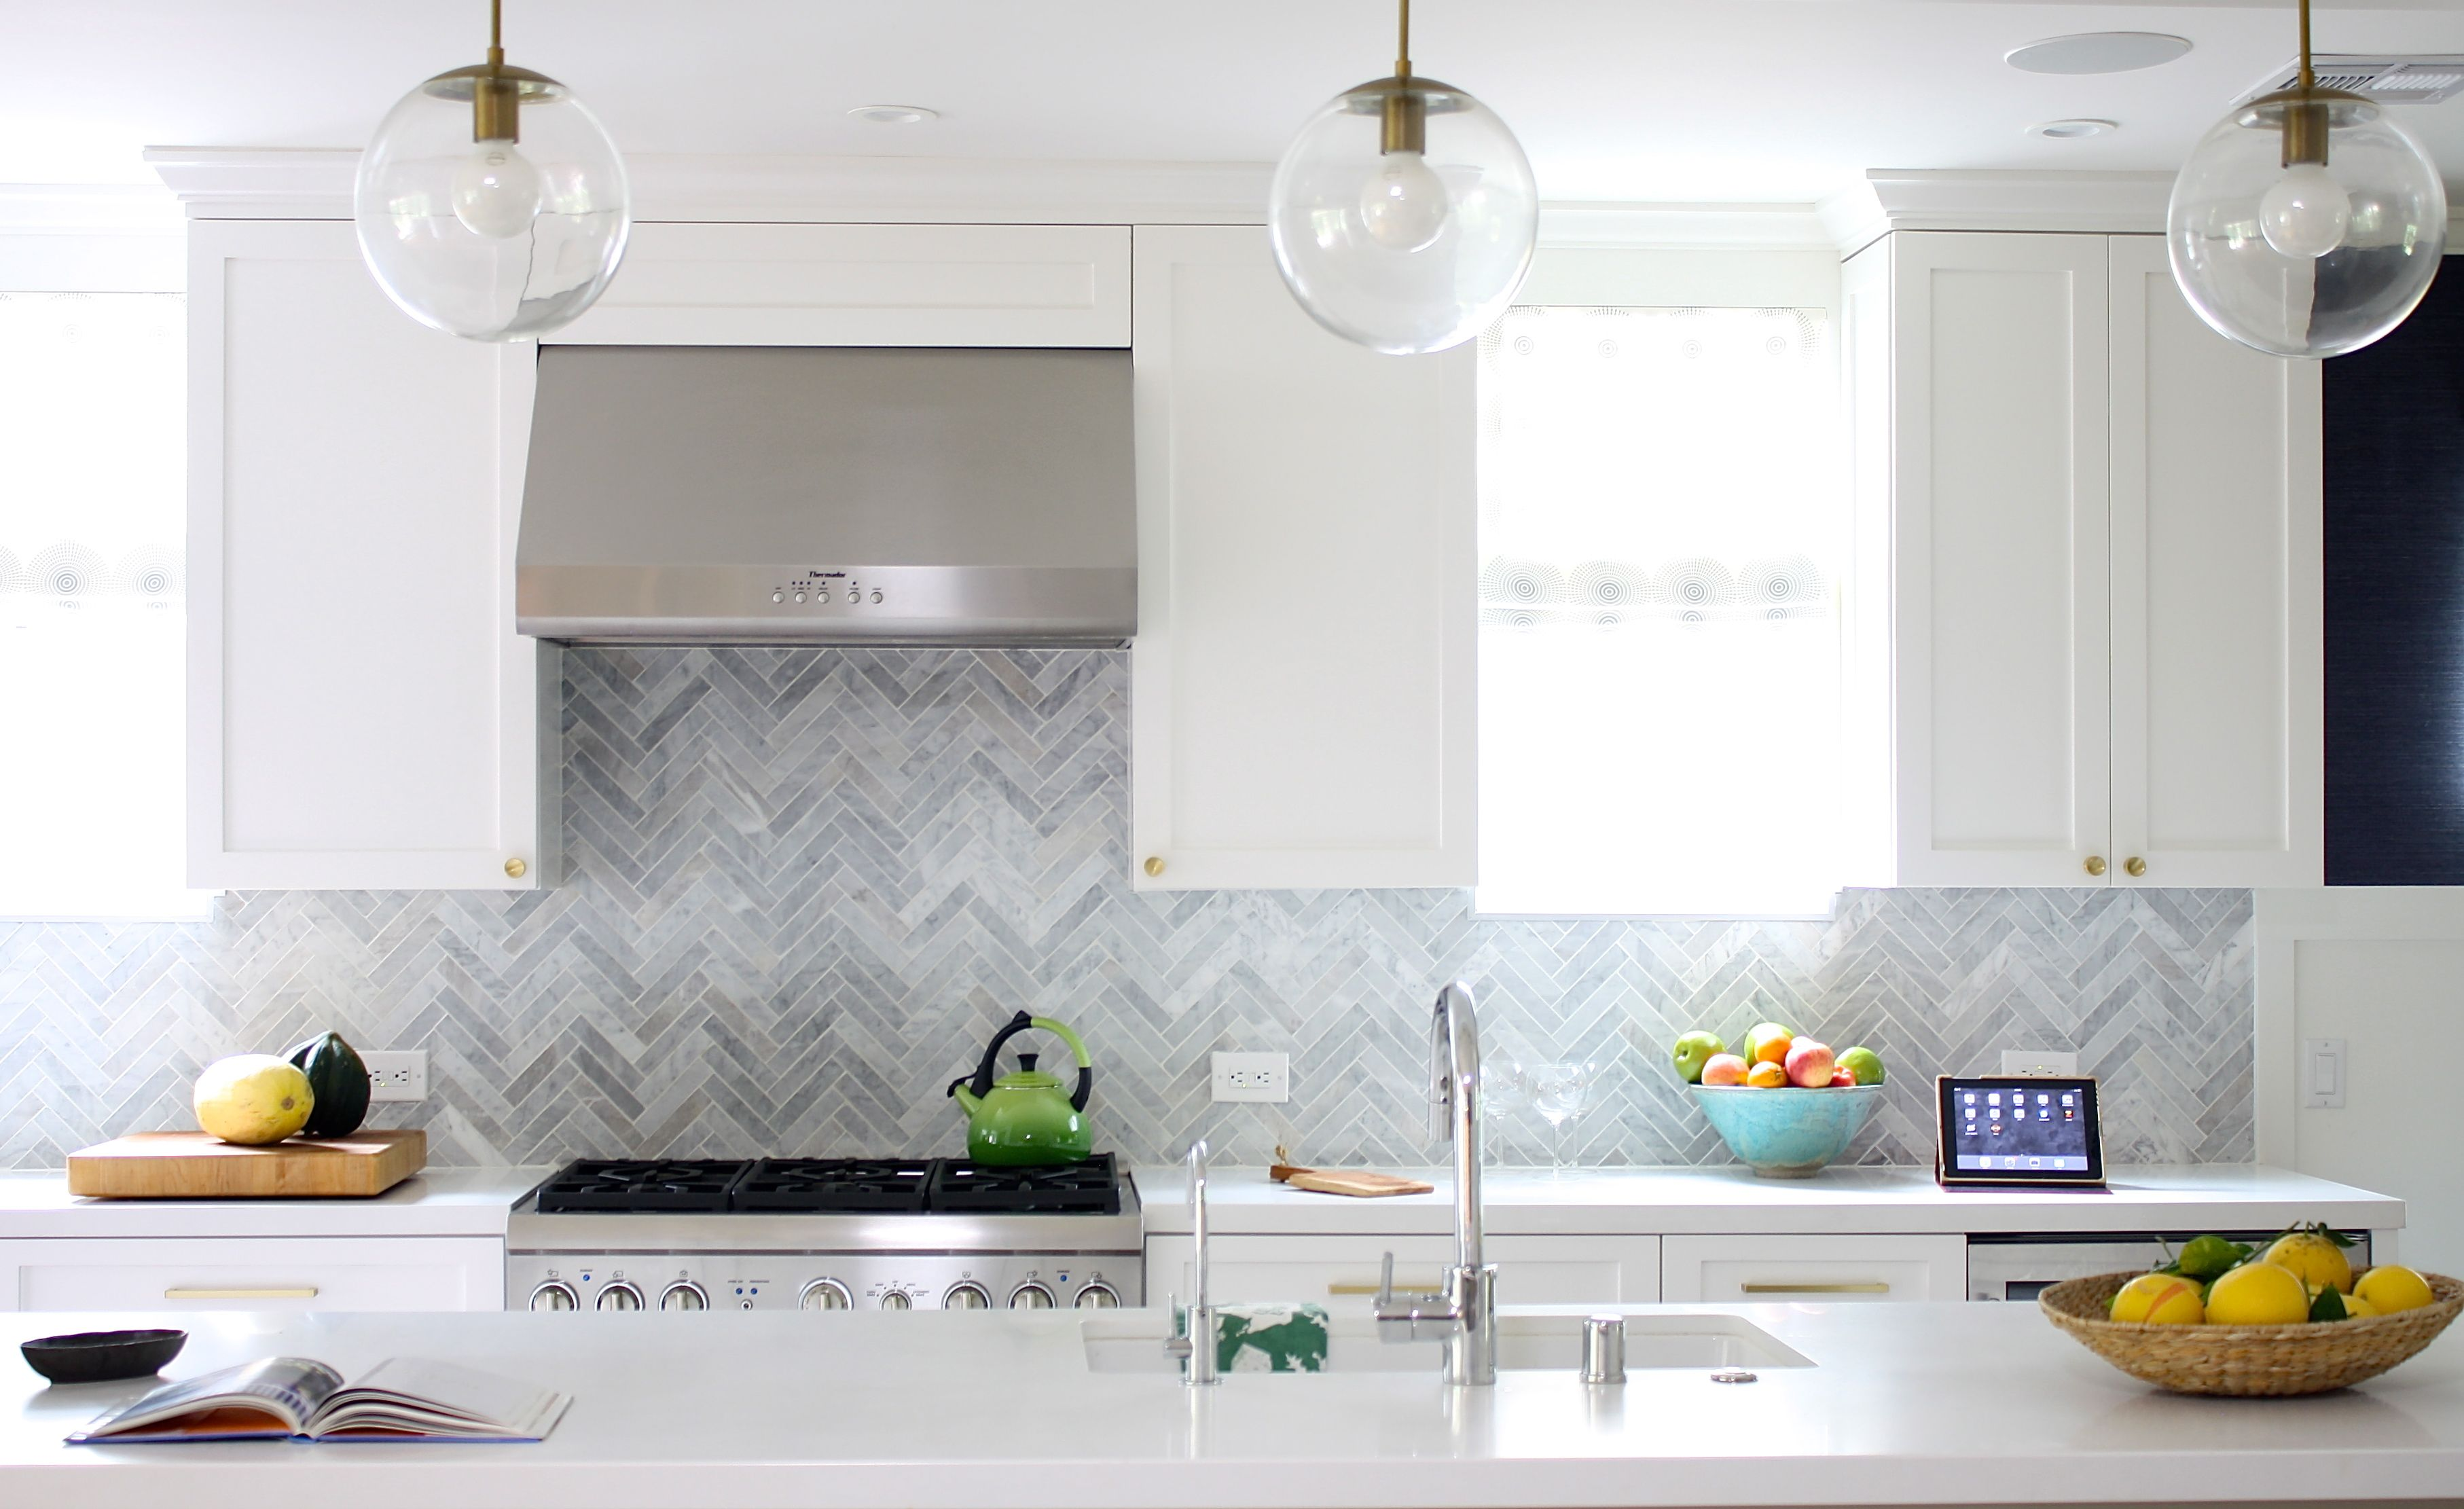 White Kitchen Herringbone Marble Backsplash Schoolhouse Electric